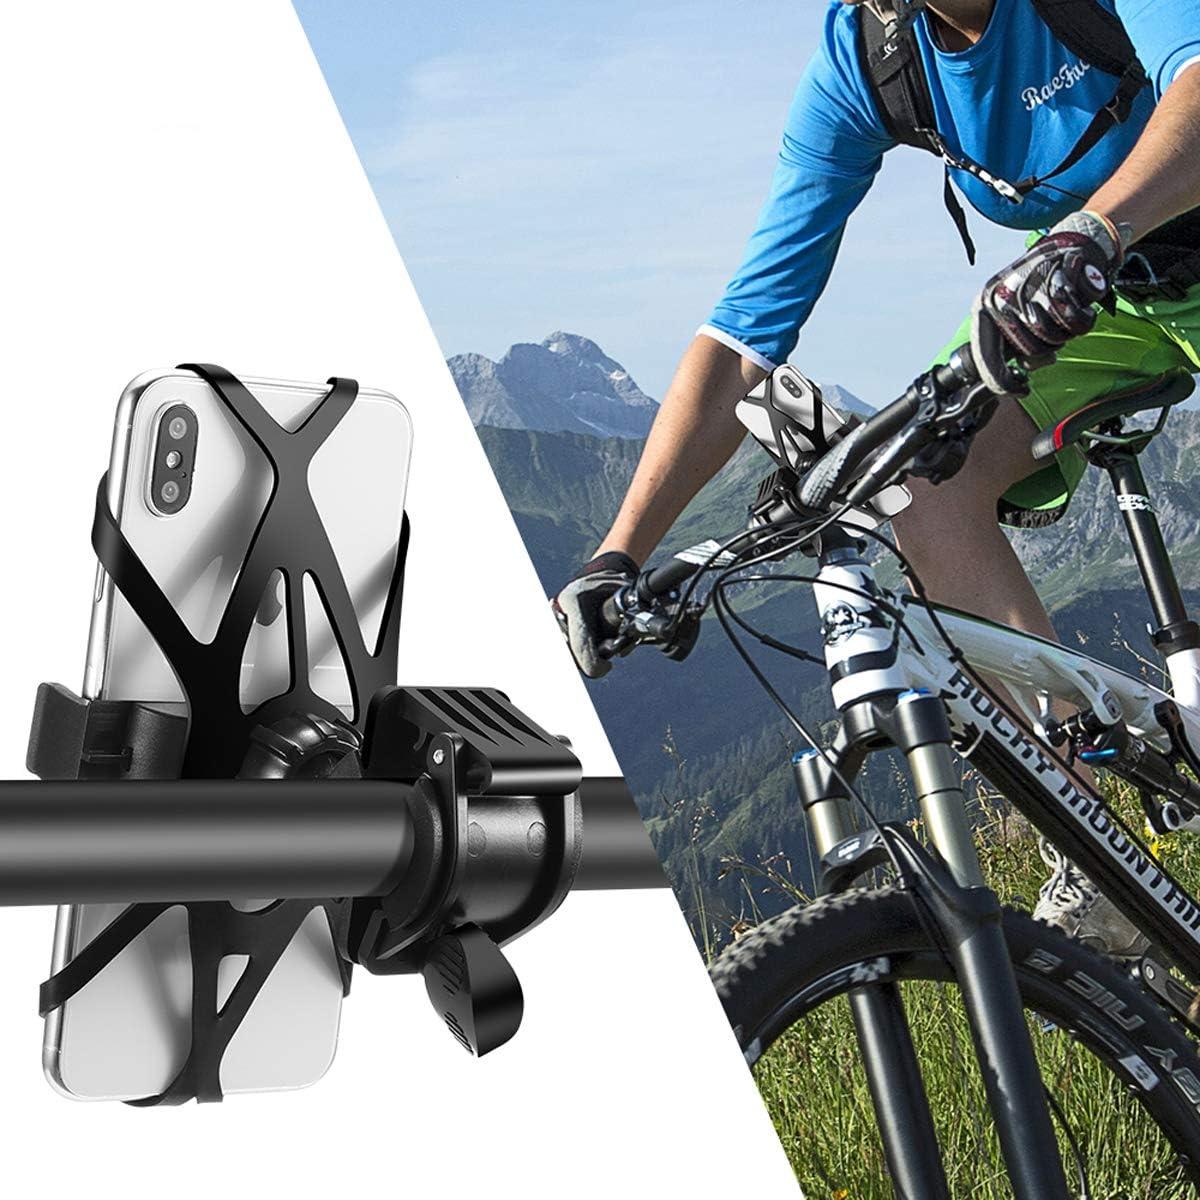 Bicycle Bike Mount Handlebar Phone Holder Grip 360° HUAWEI P9 LITE